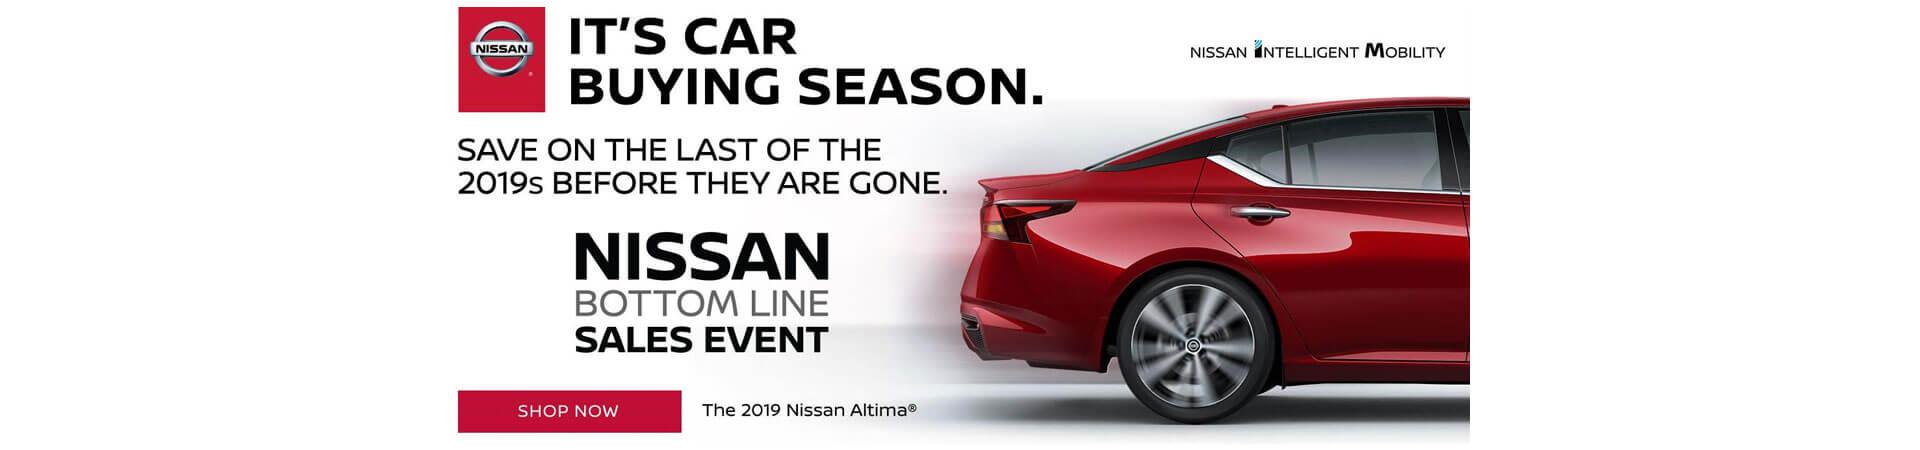 Kona Nissan | Nissan & Used Cars | Kona Nissan Serving